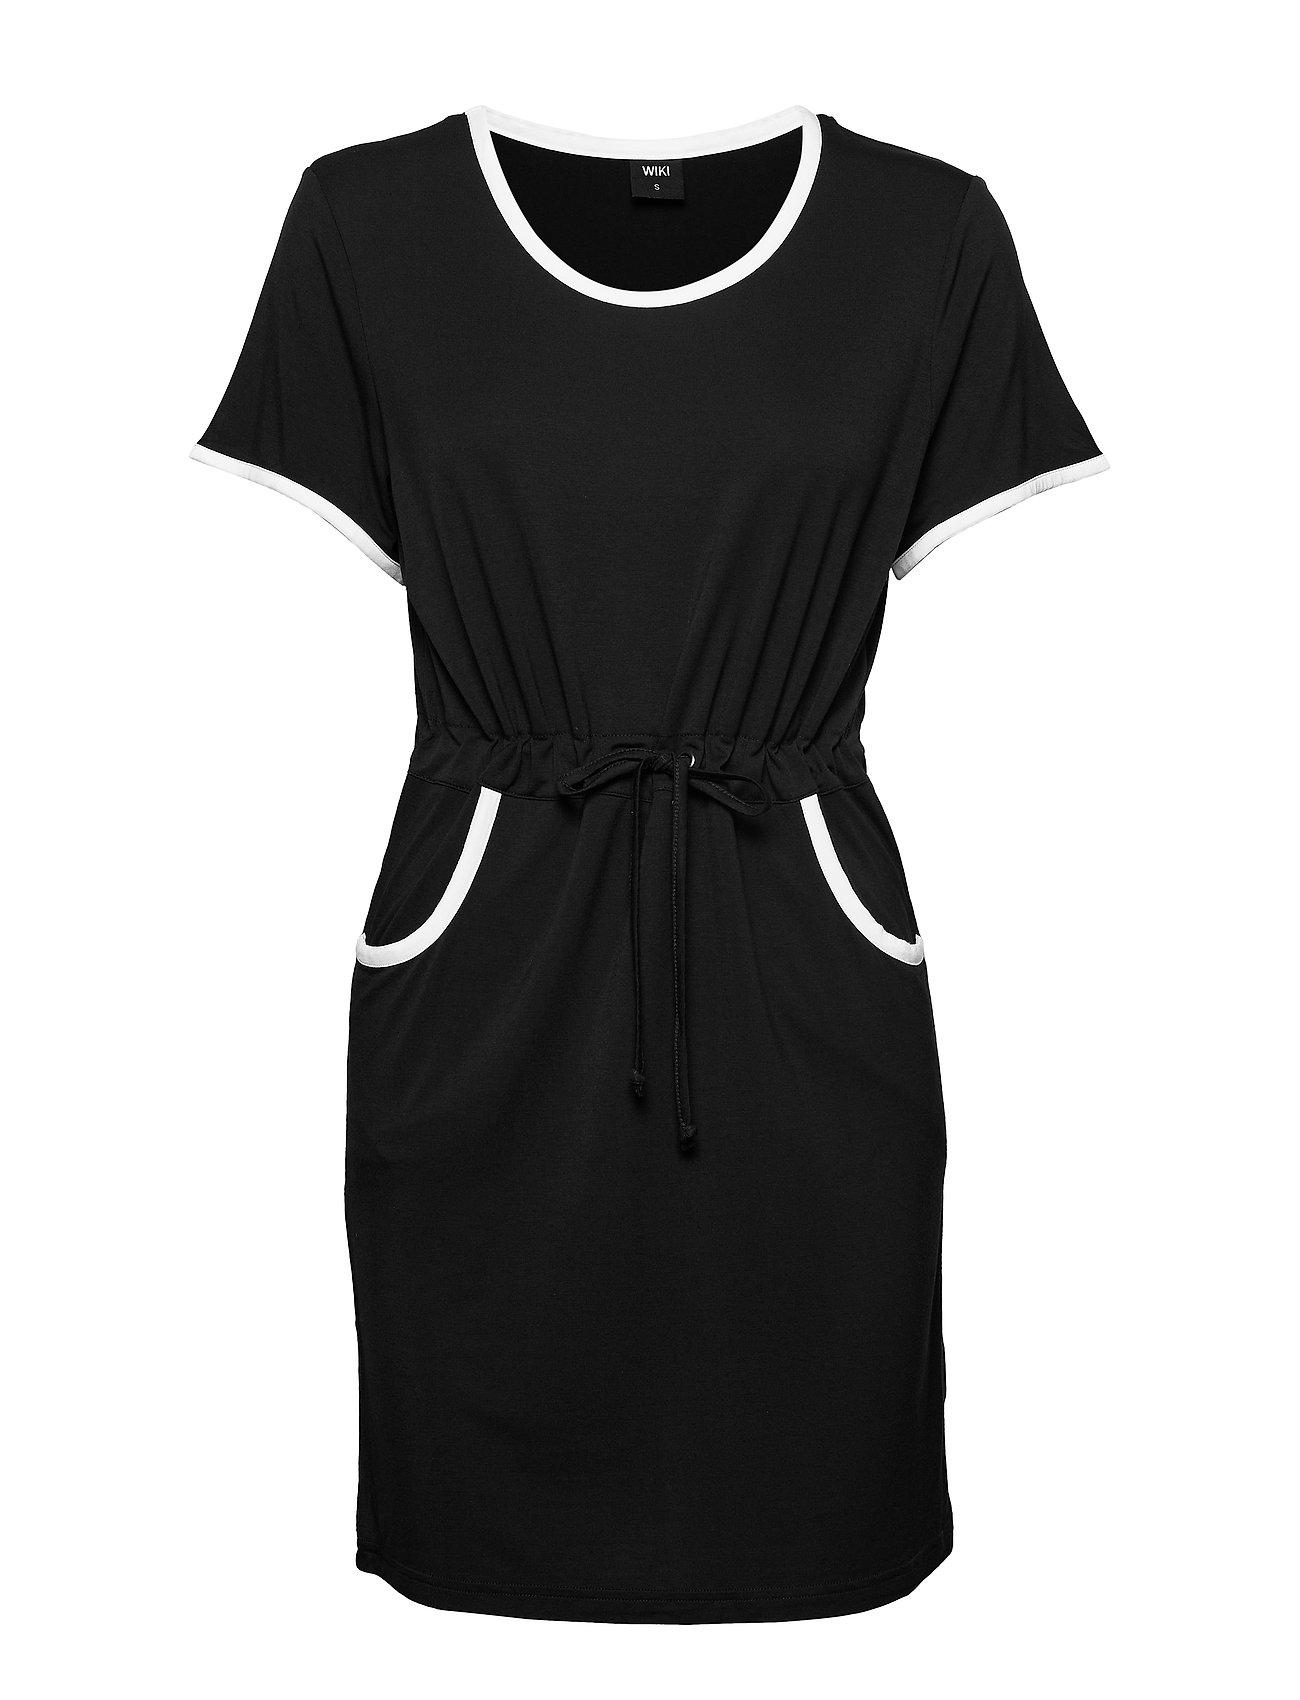 Image of Bamboo Beach Dress Badetøj Sort Wiki (3377374493)